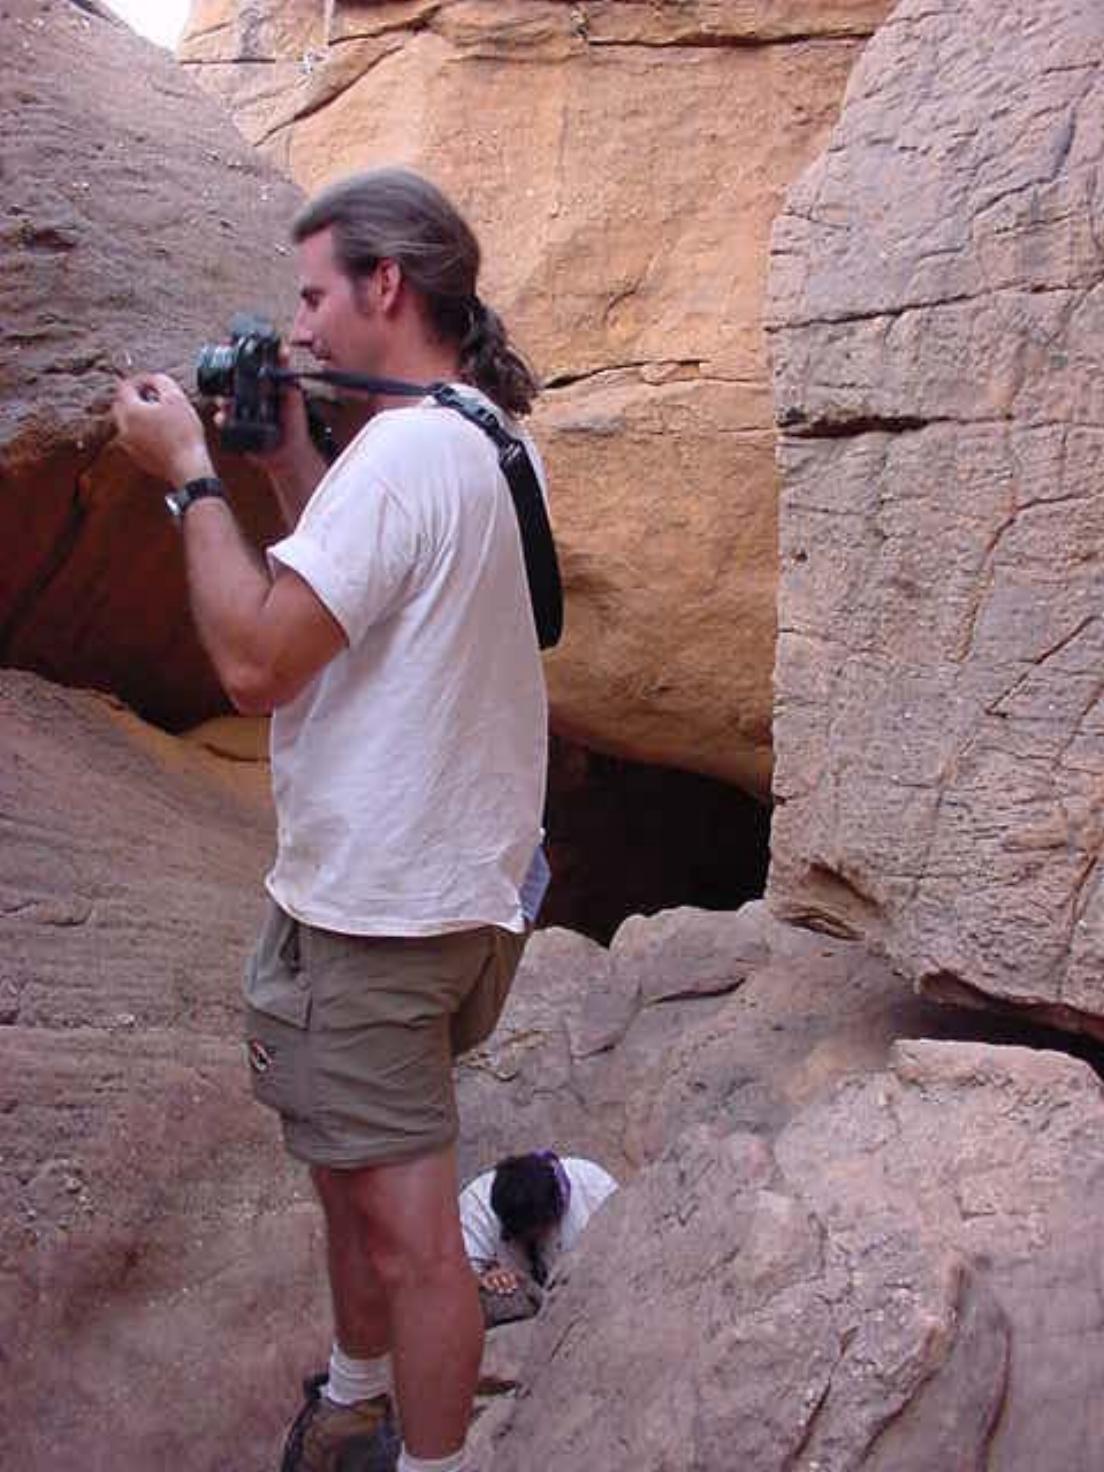 Jim Leach and his camera